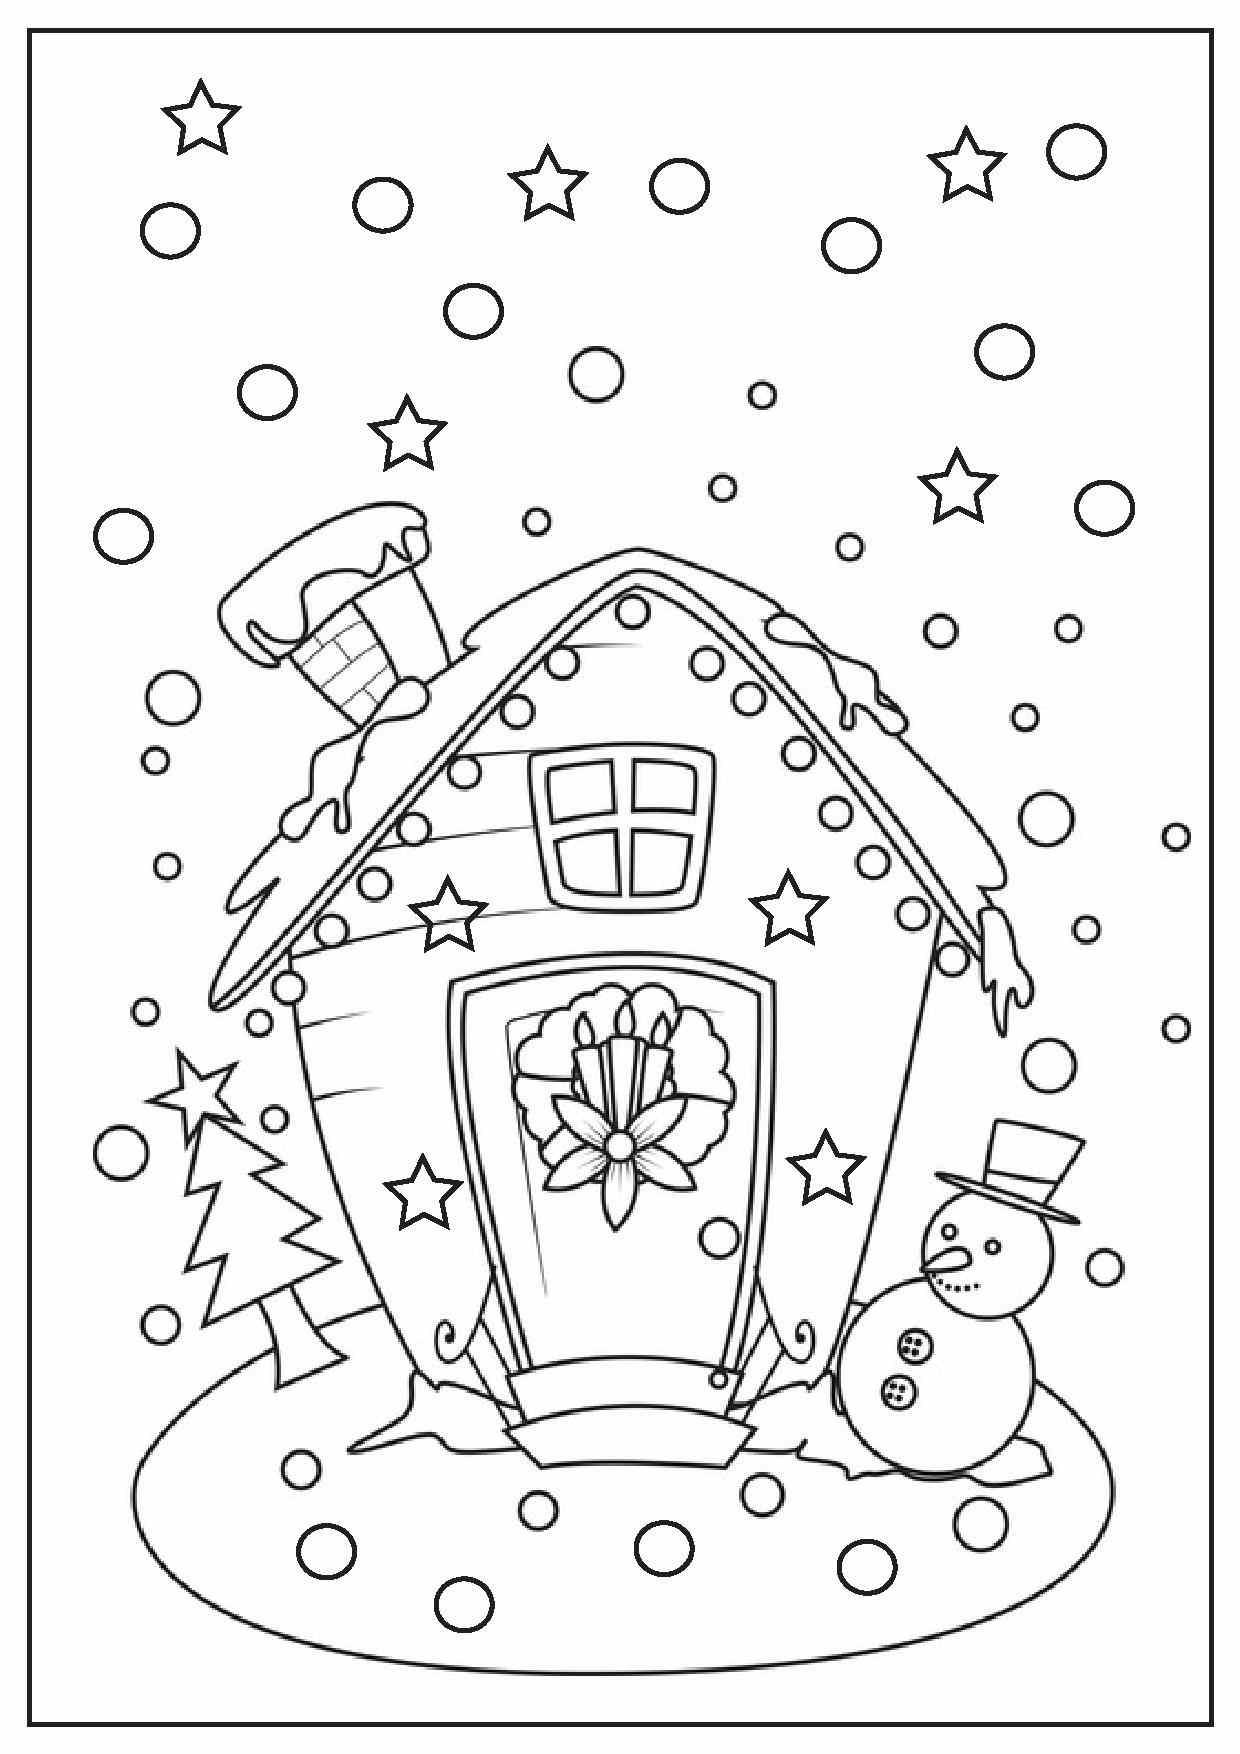 math worksheet : christmas activity worksheets for kindergarten  worksheets : Kindergarten Christmas Worksheets